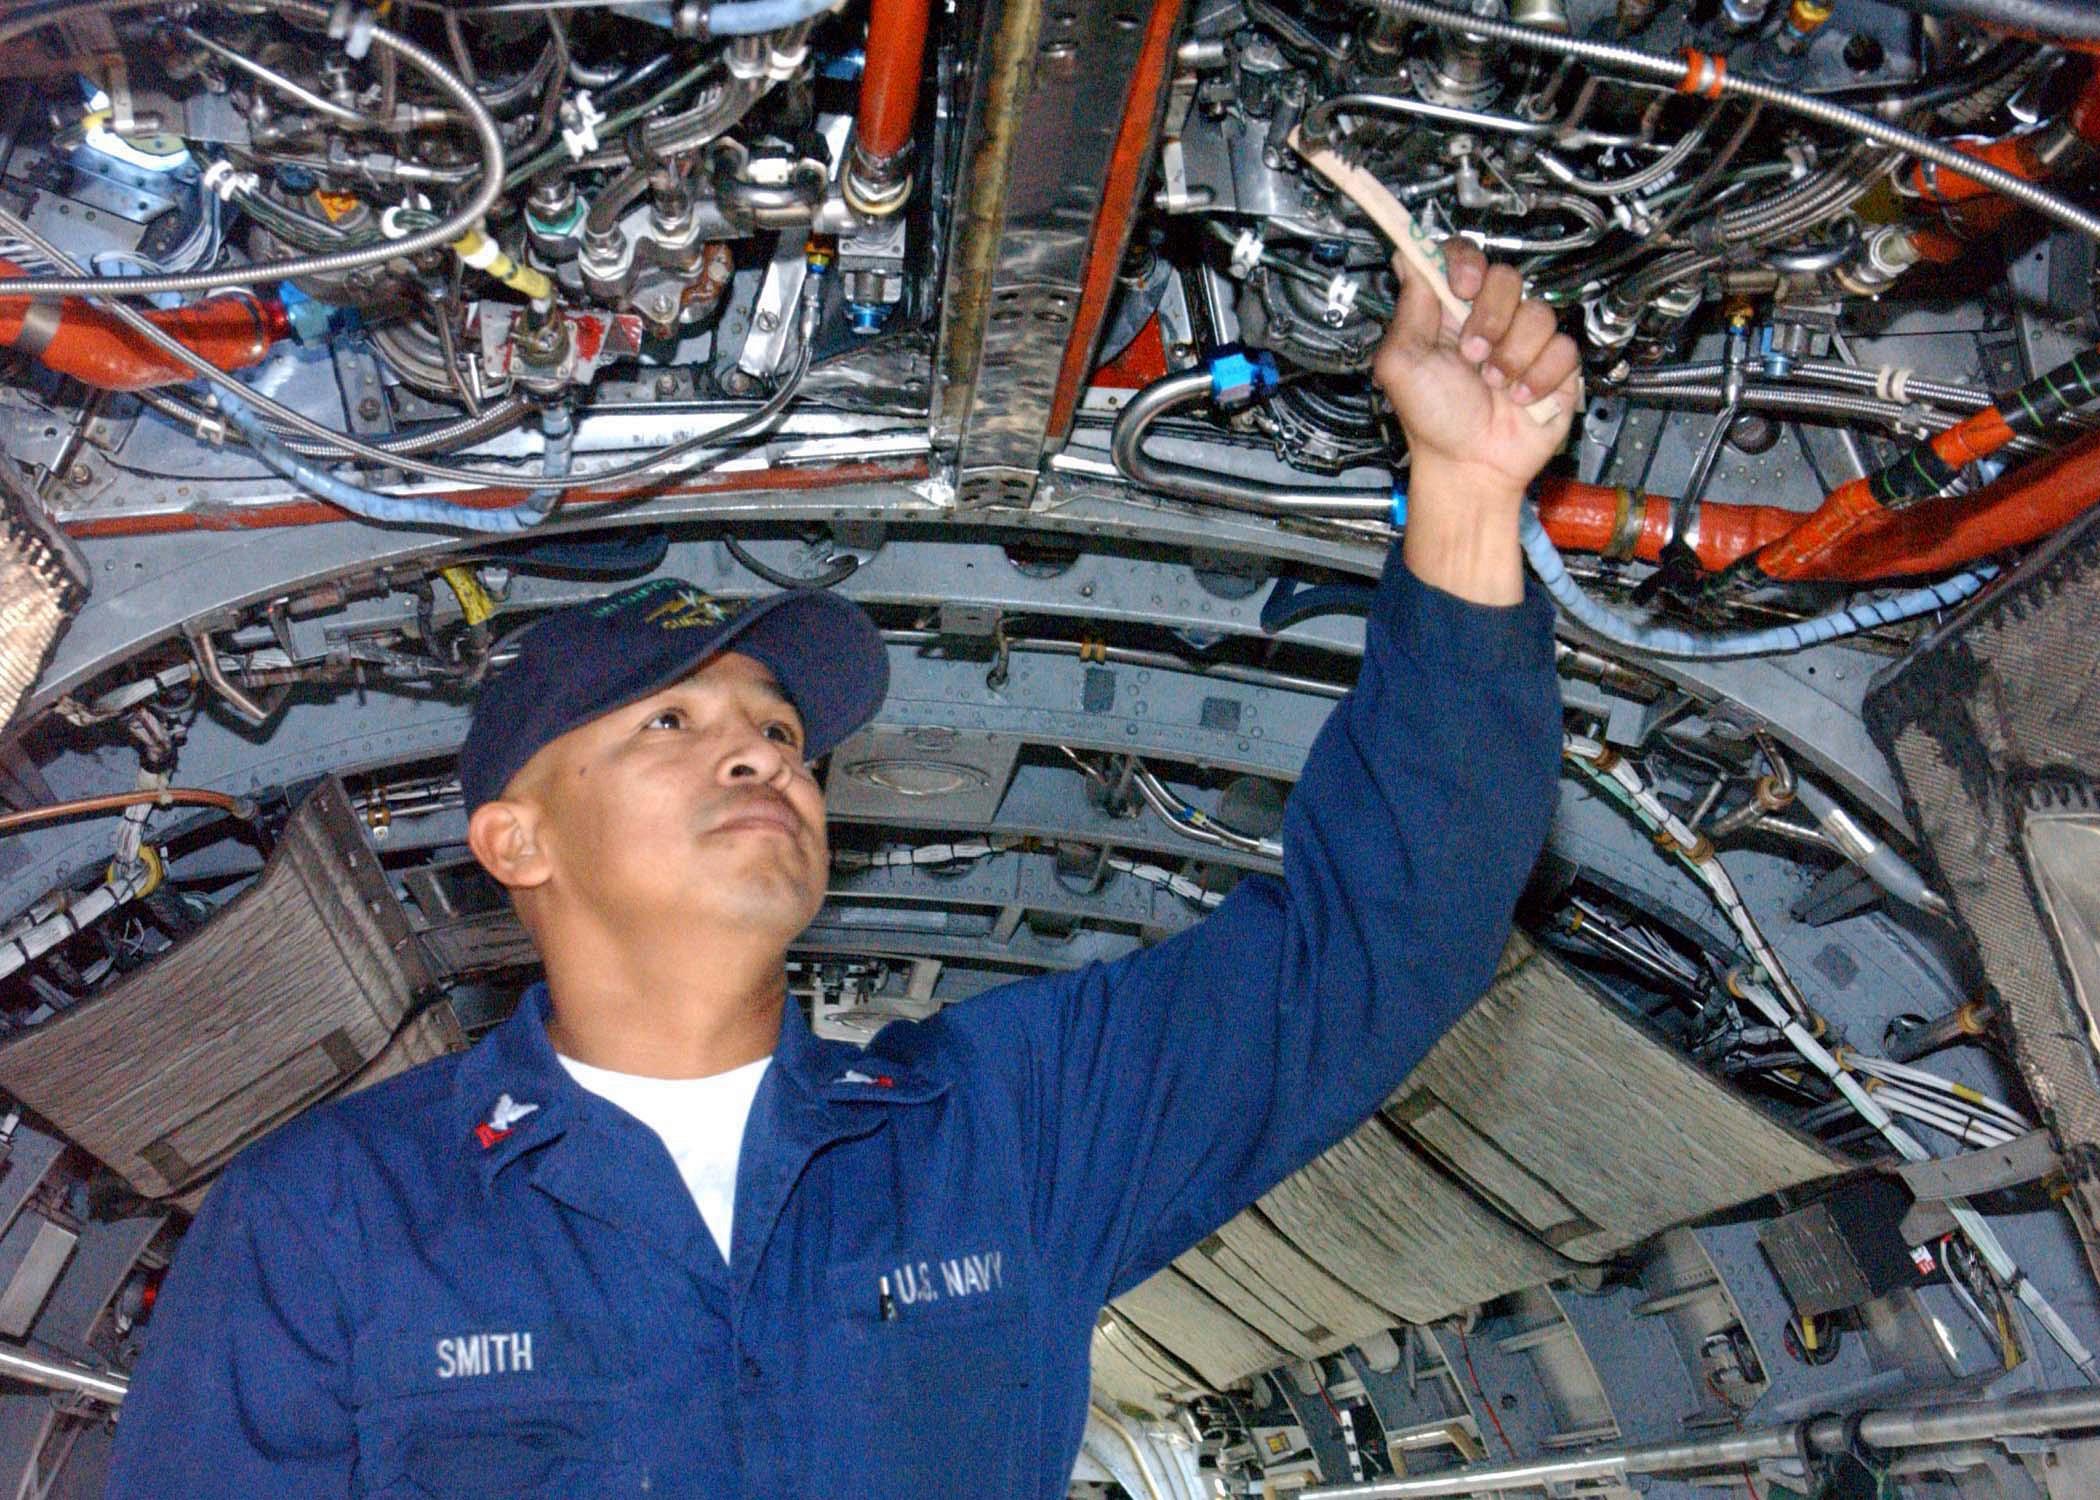 fileus navy 021122 n 8156w 002 aviation machinist mate 2nd class